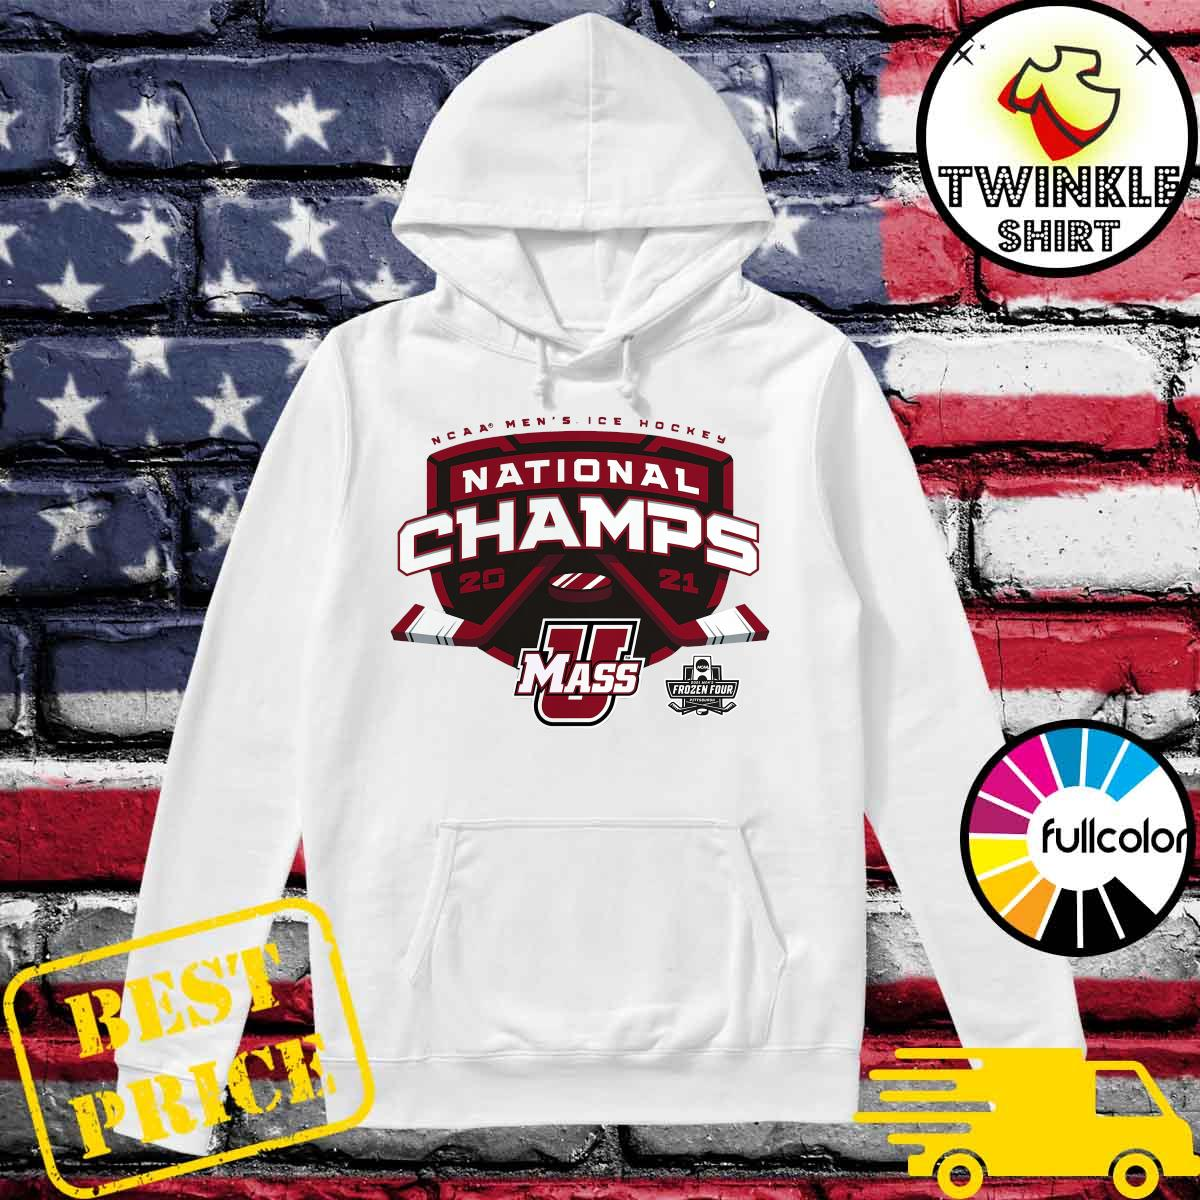 Official UMass Minutemen 2021 NCAA Men's Ice Hockey National Champions T-Shirt Hoodie